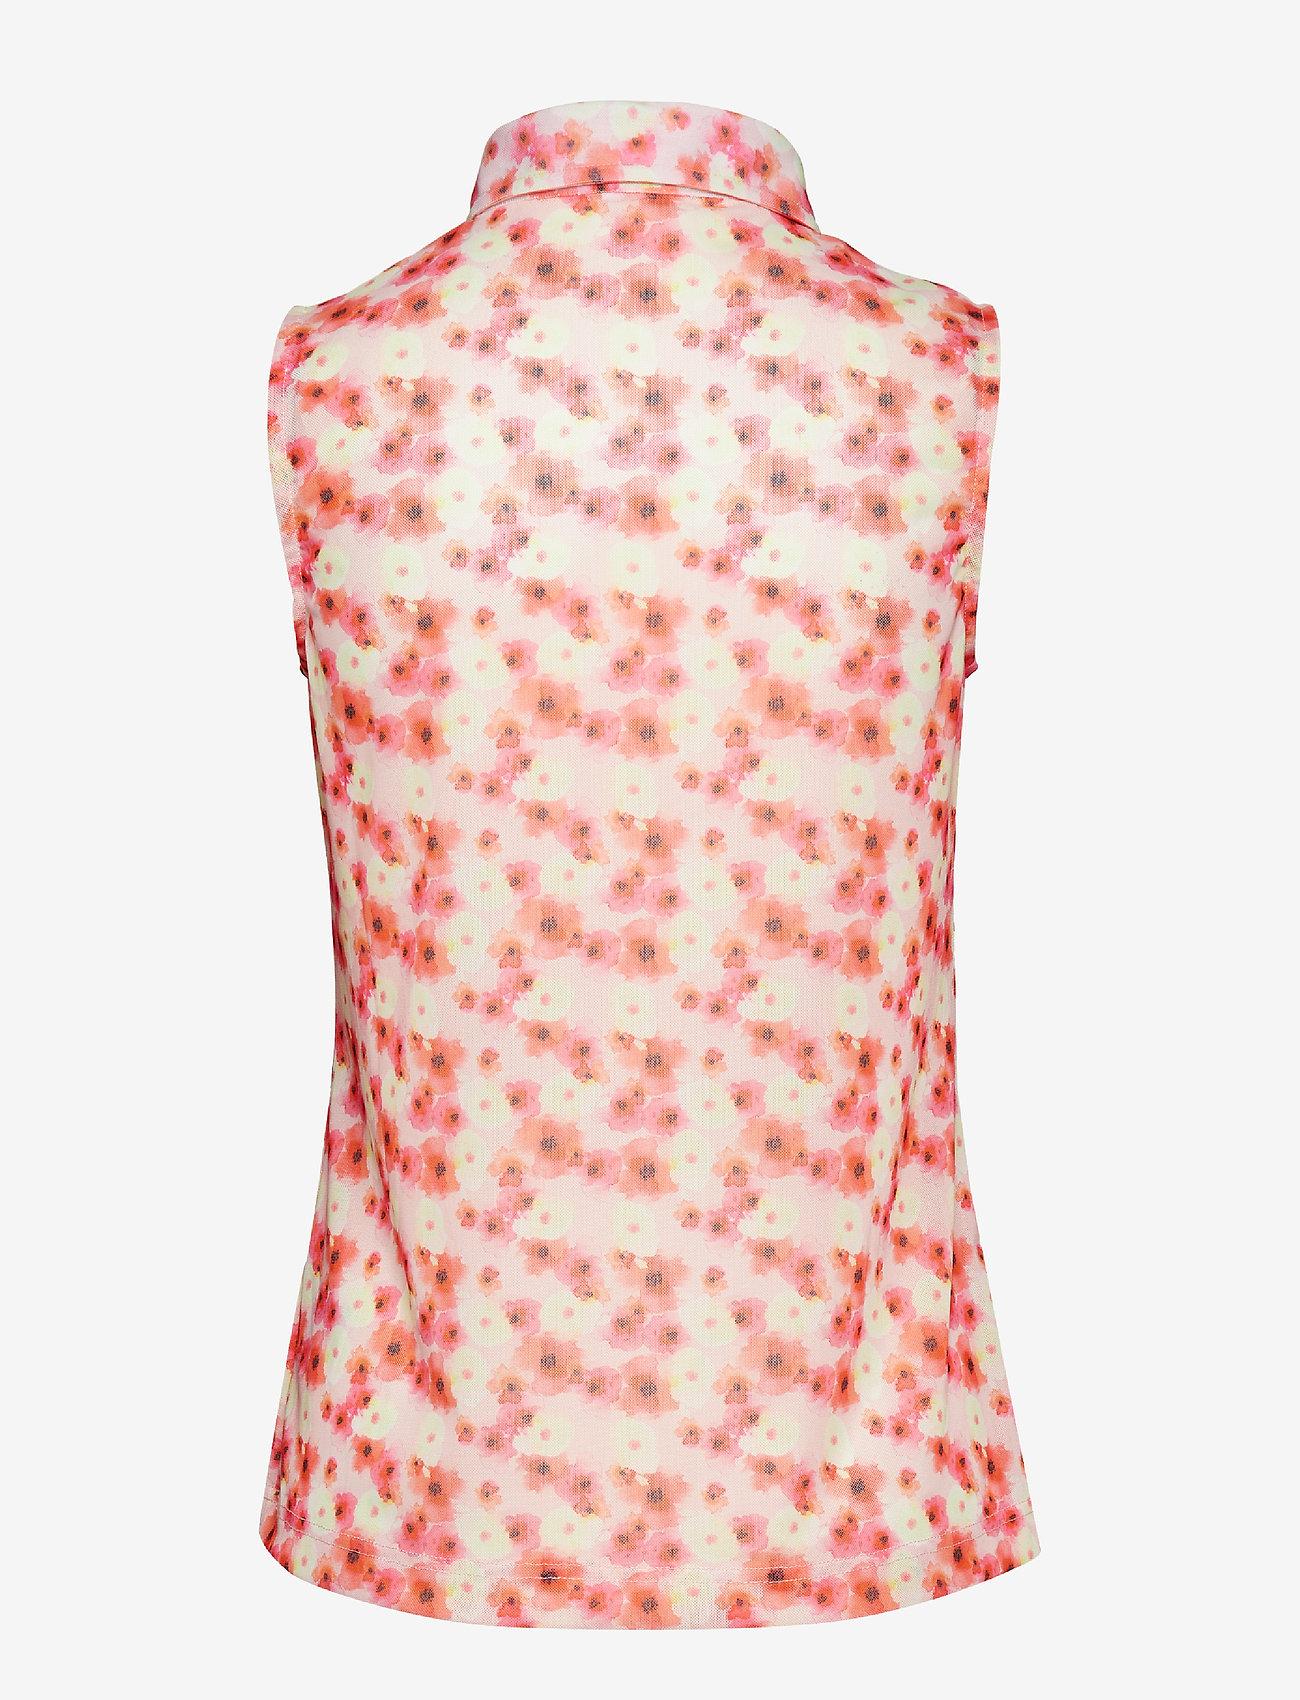 Tori Mesh Sl Polo Shirt (Blush) (274.50 kr) - Daily Sports APQQA7aM